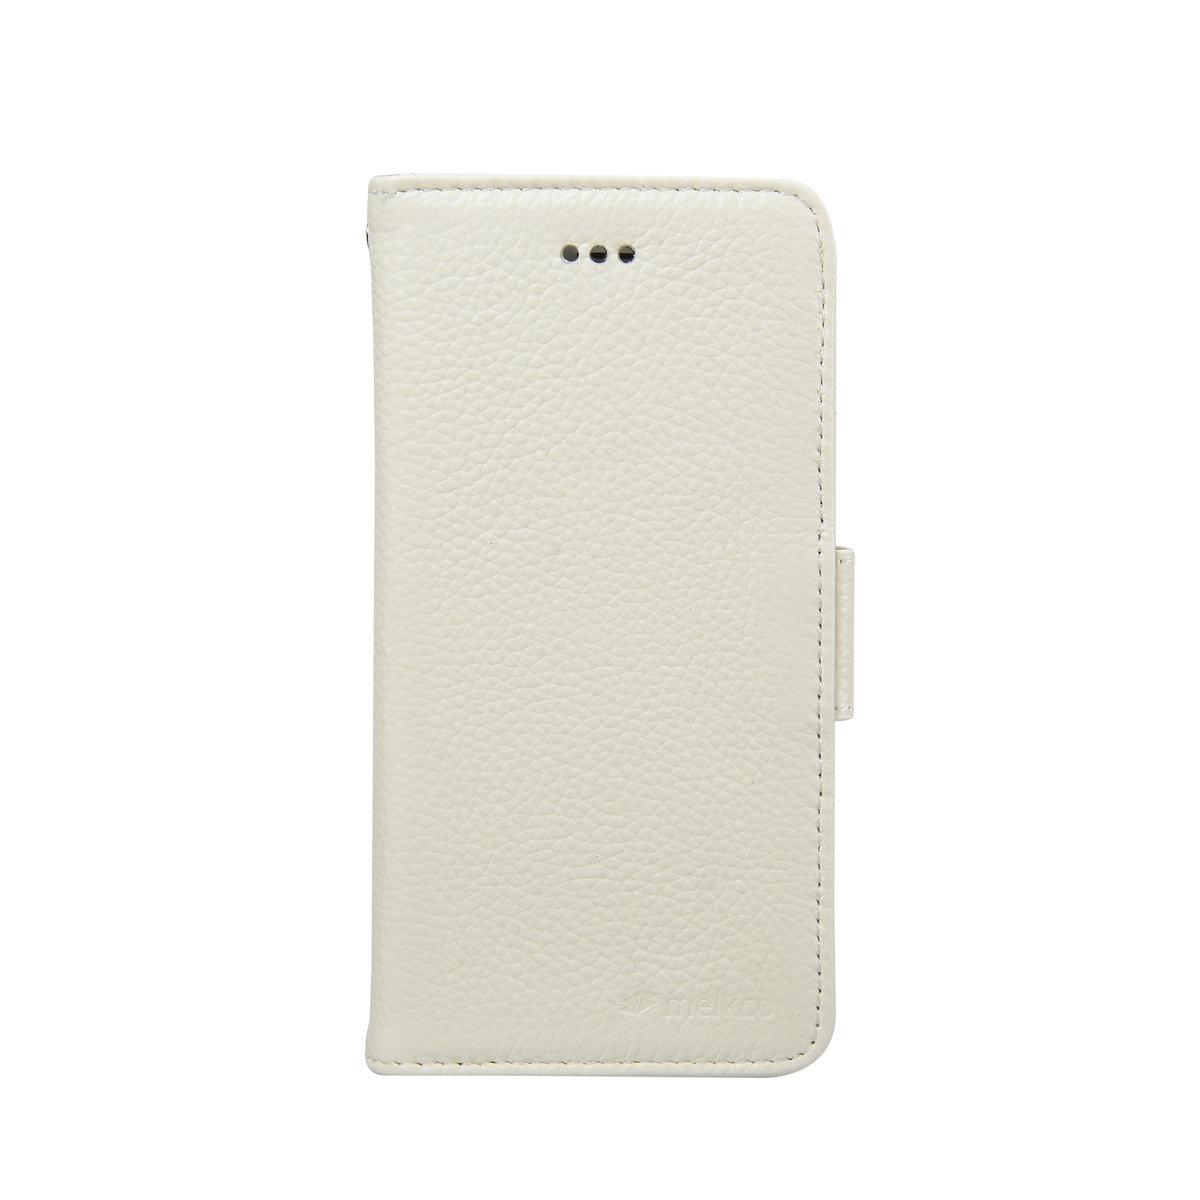 "iPhone 6/6S (4.7"") Wallet Book Type高級真皮手機套 - 白色荔枝紋"